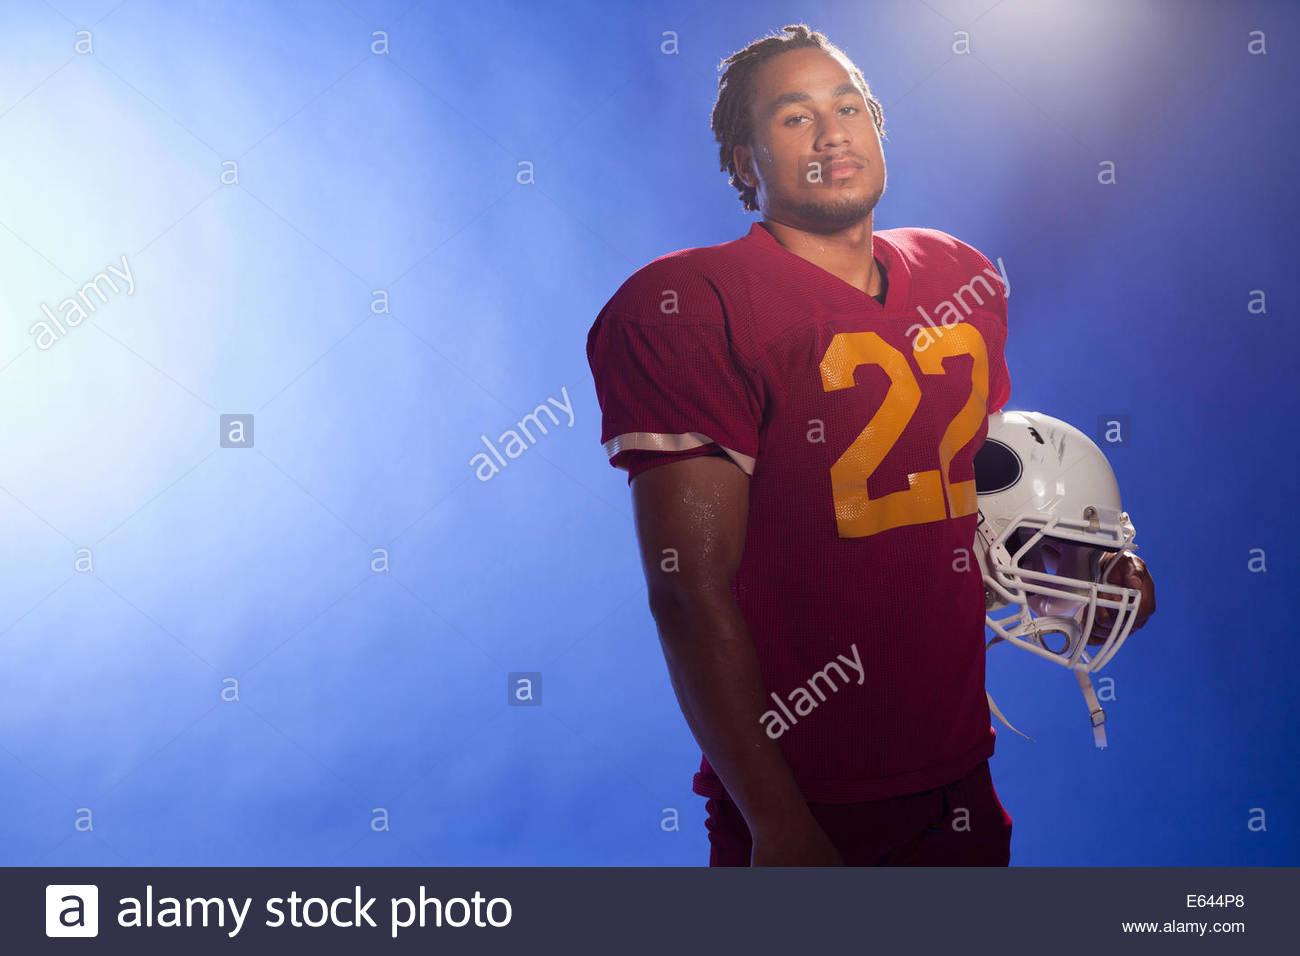 Fußball Spieler tragen Helm Stockbild